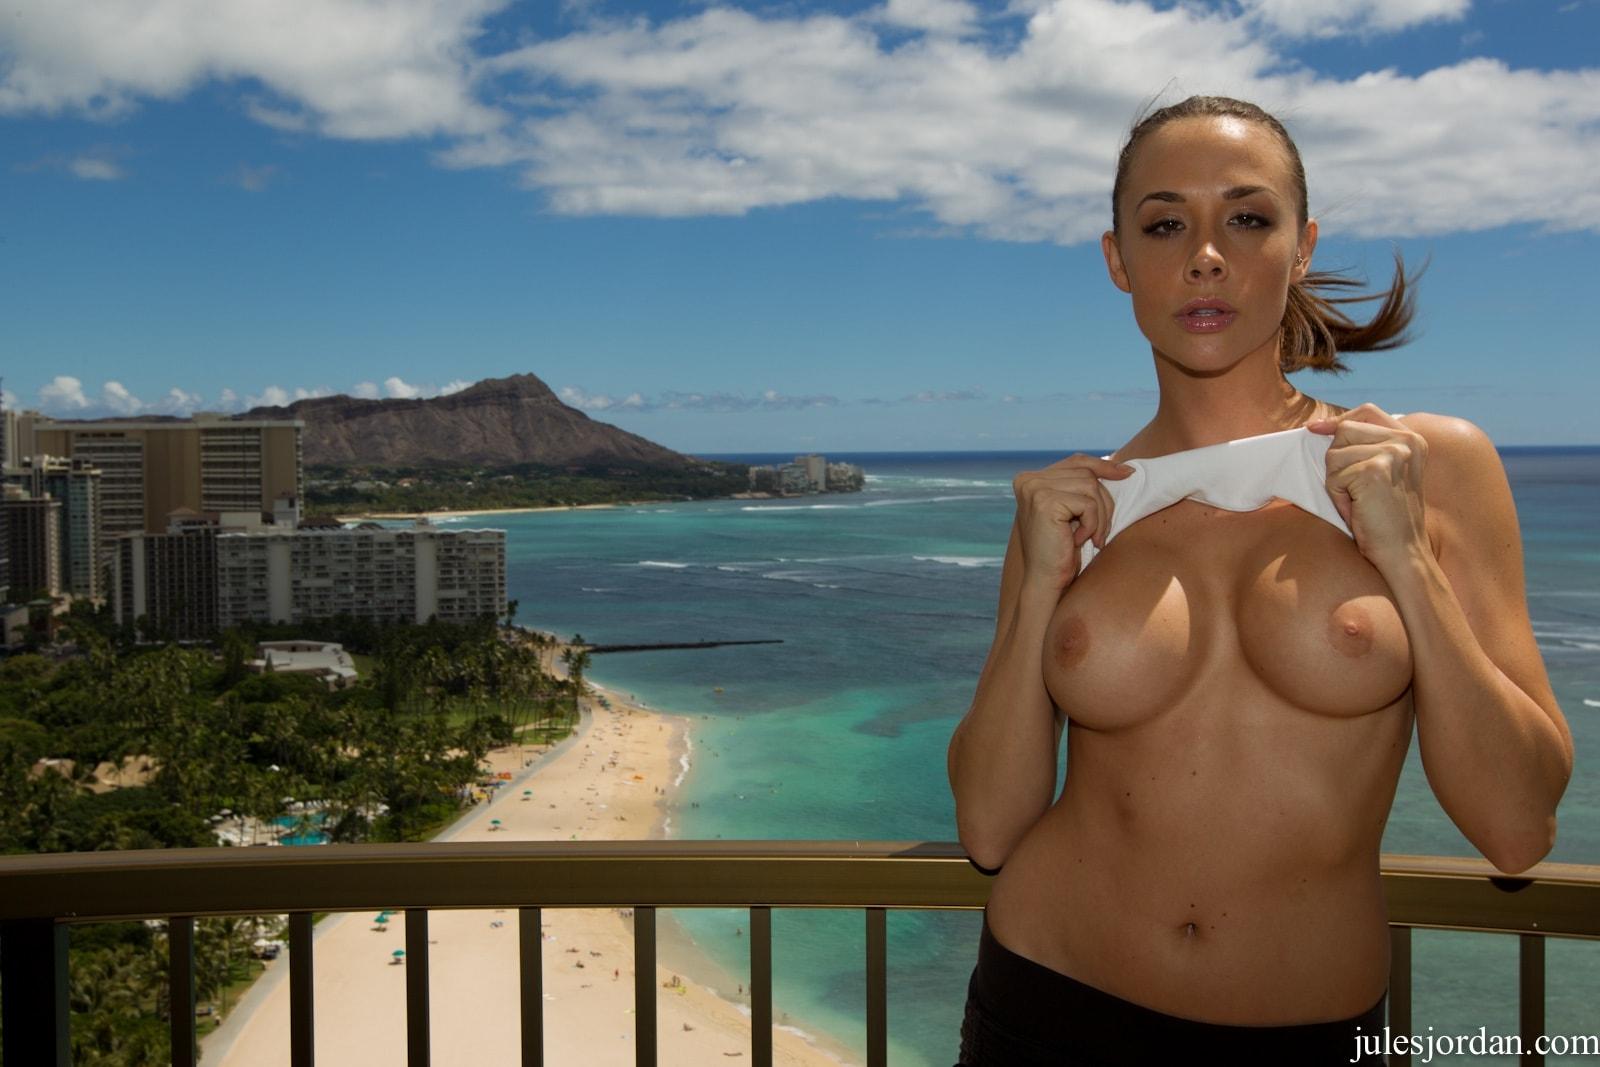 Jules Jordan 'Beach Patrol 2' starring Chanel Preston (Photo 12)